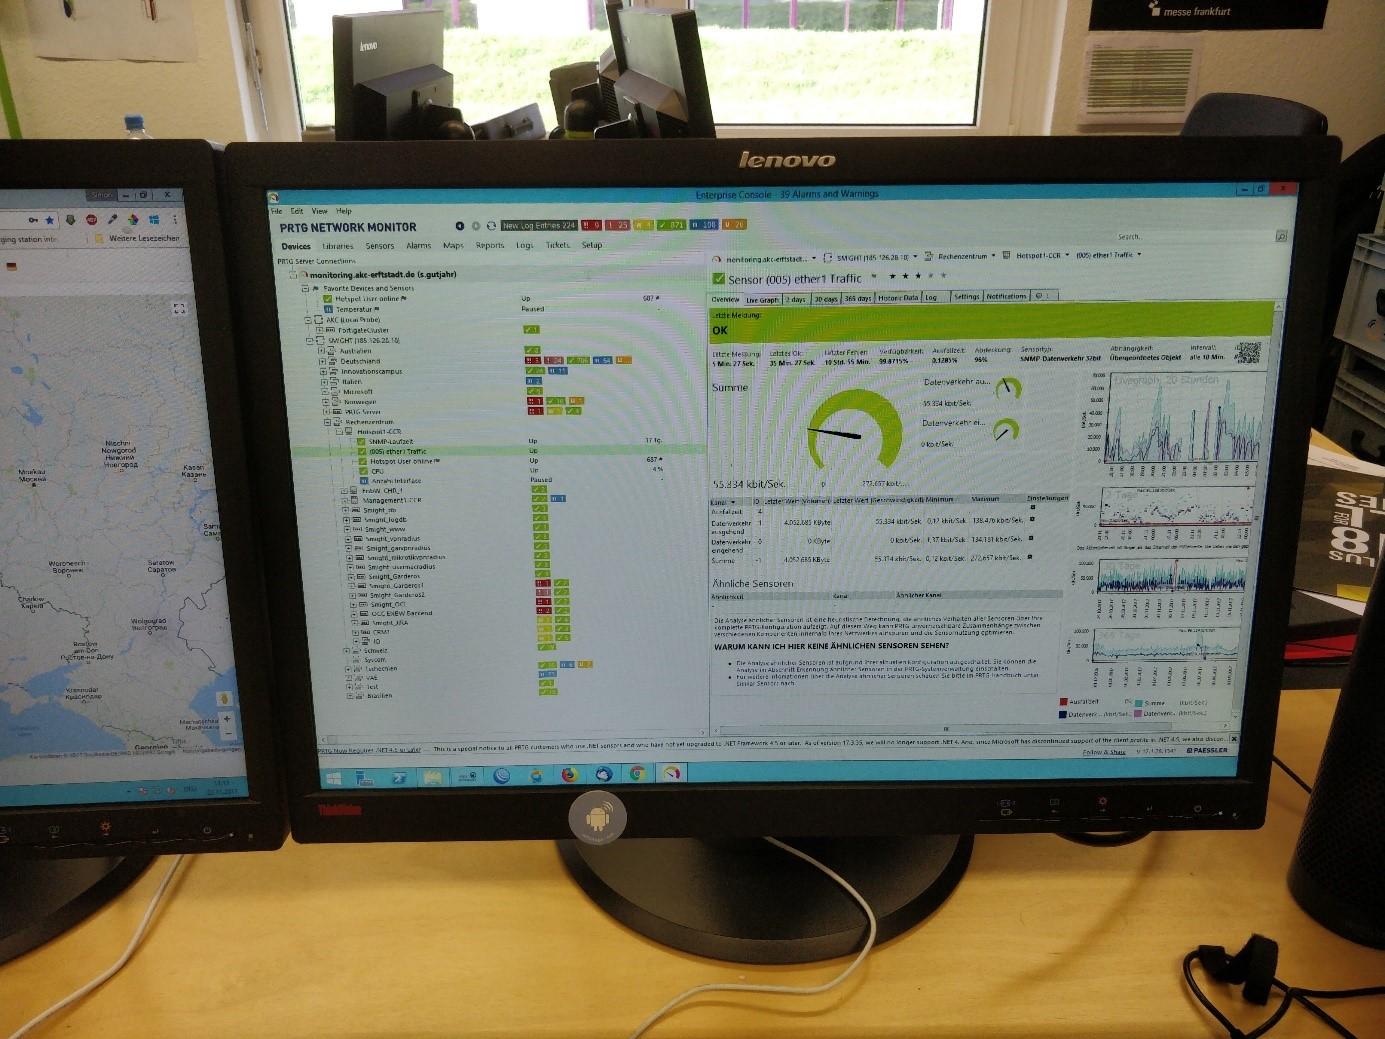 prtg-network-monitor-smght4.jpg